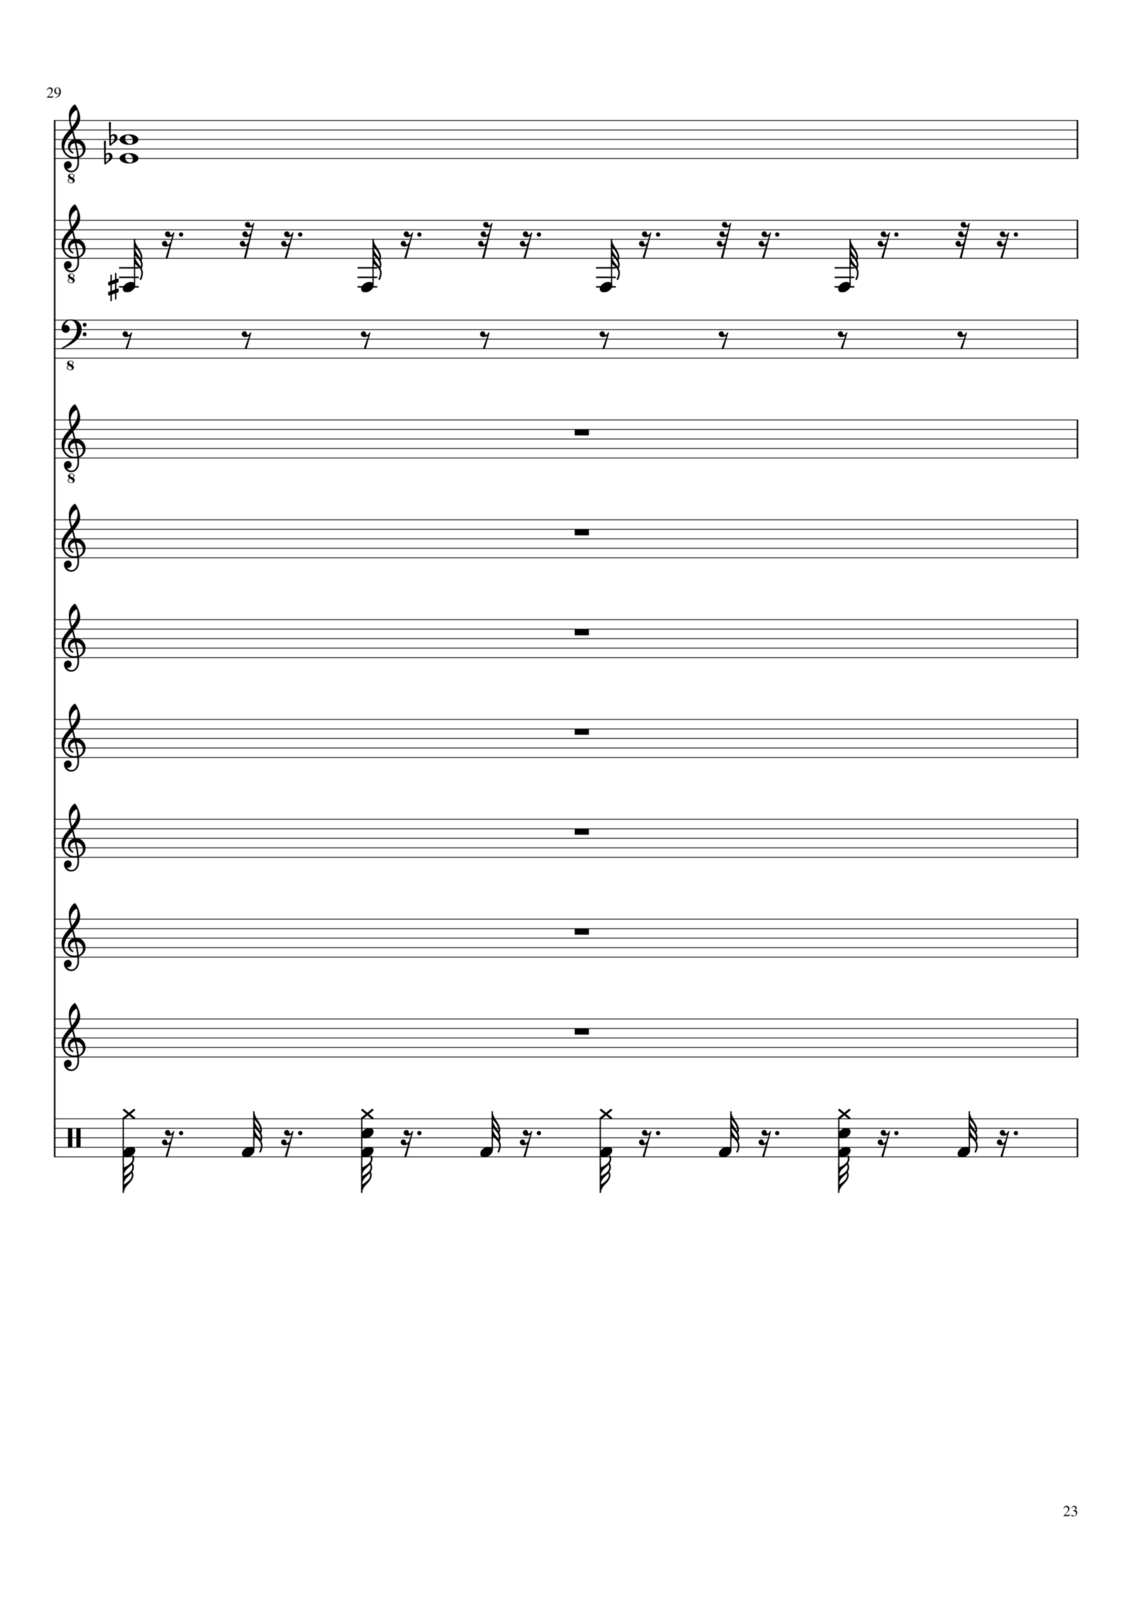 Belyiy sokol slide, Image 23